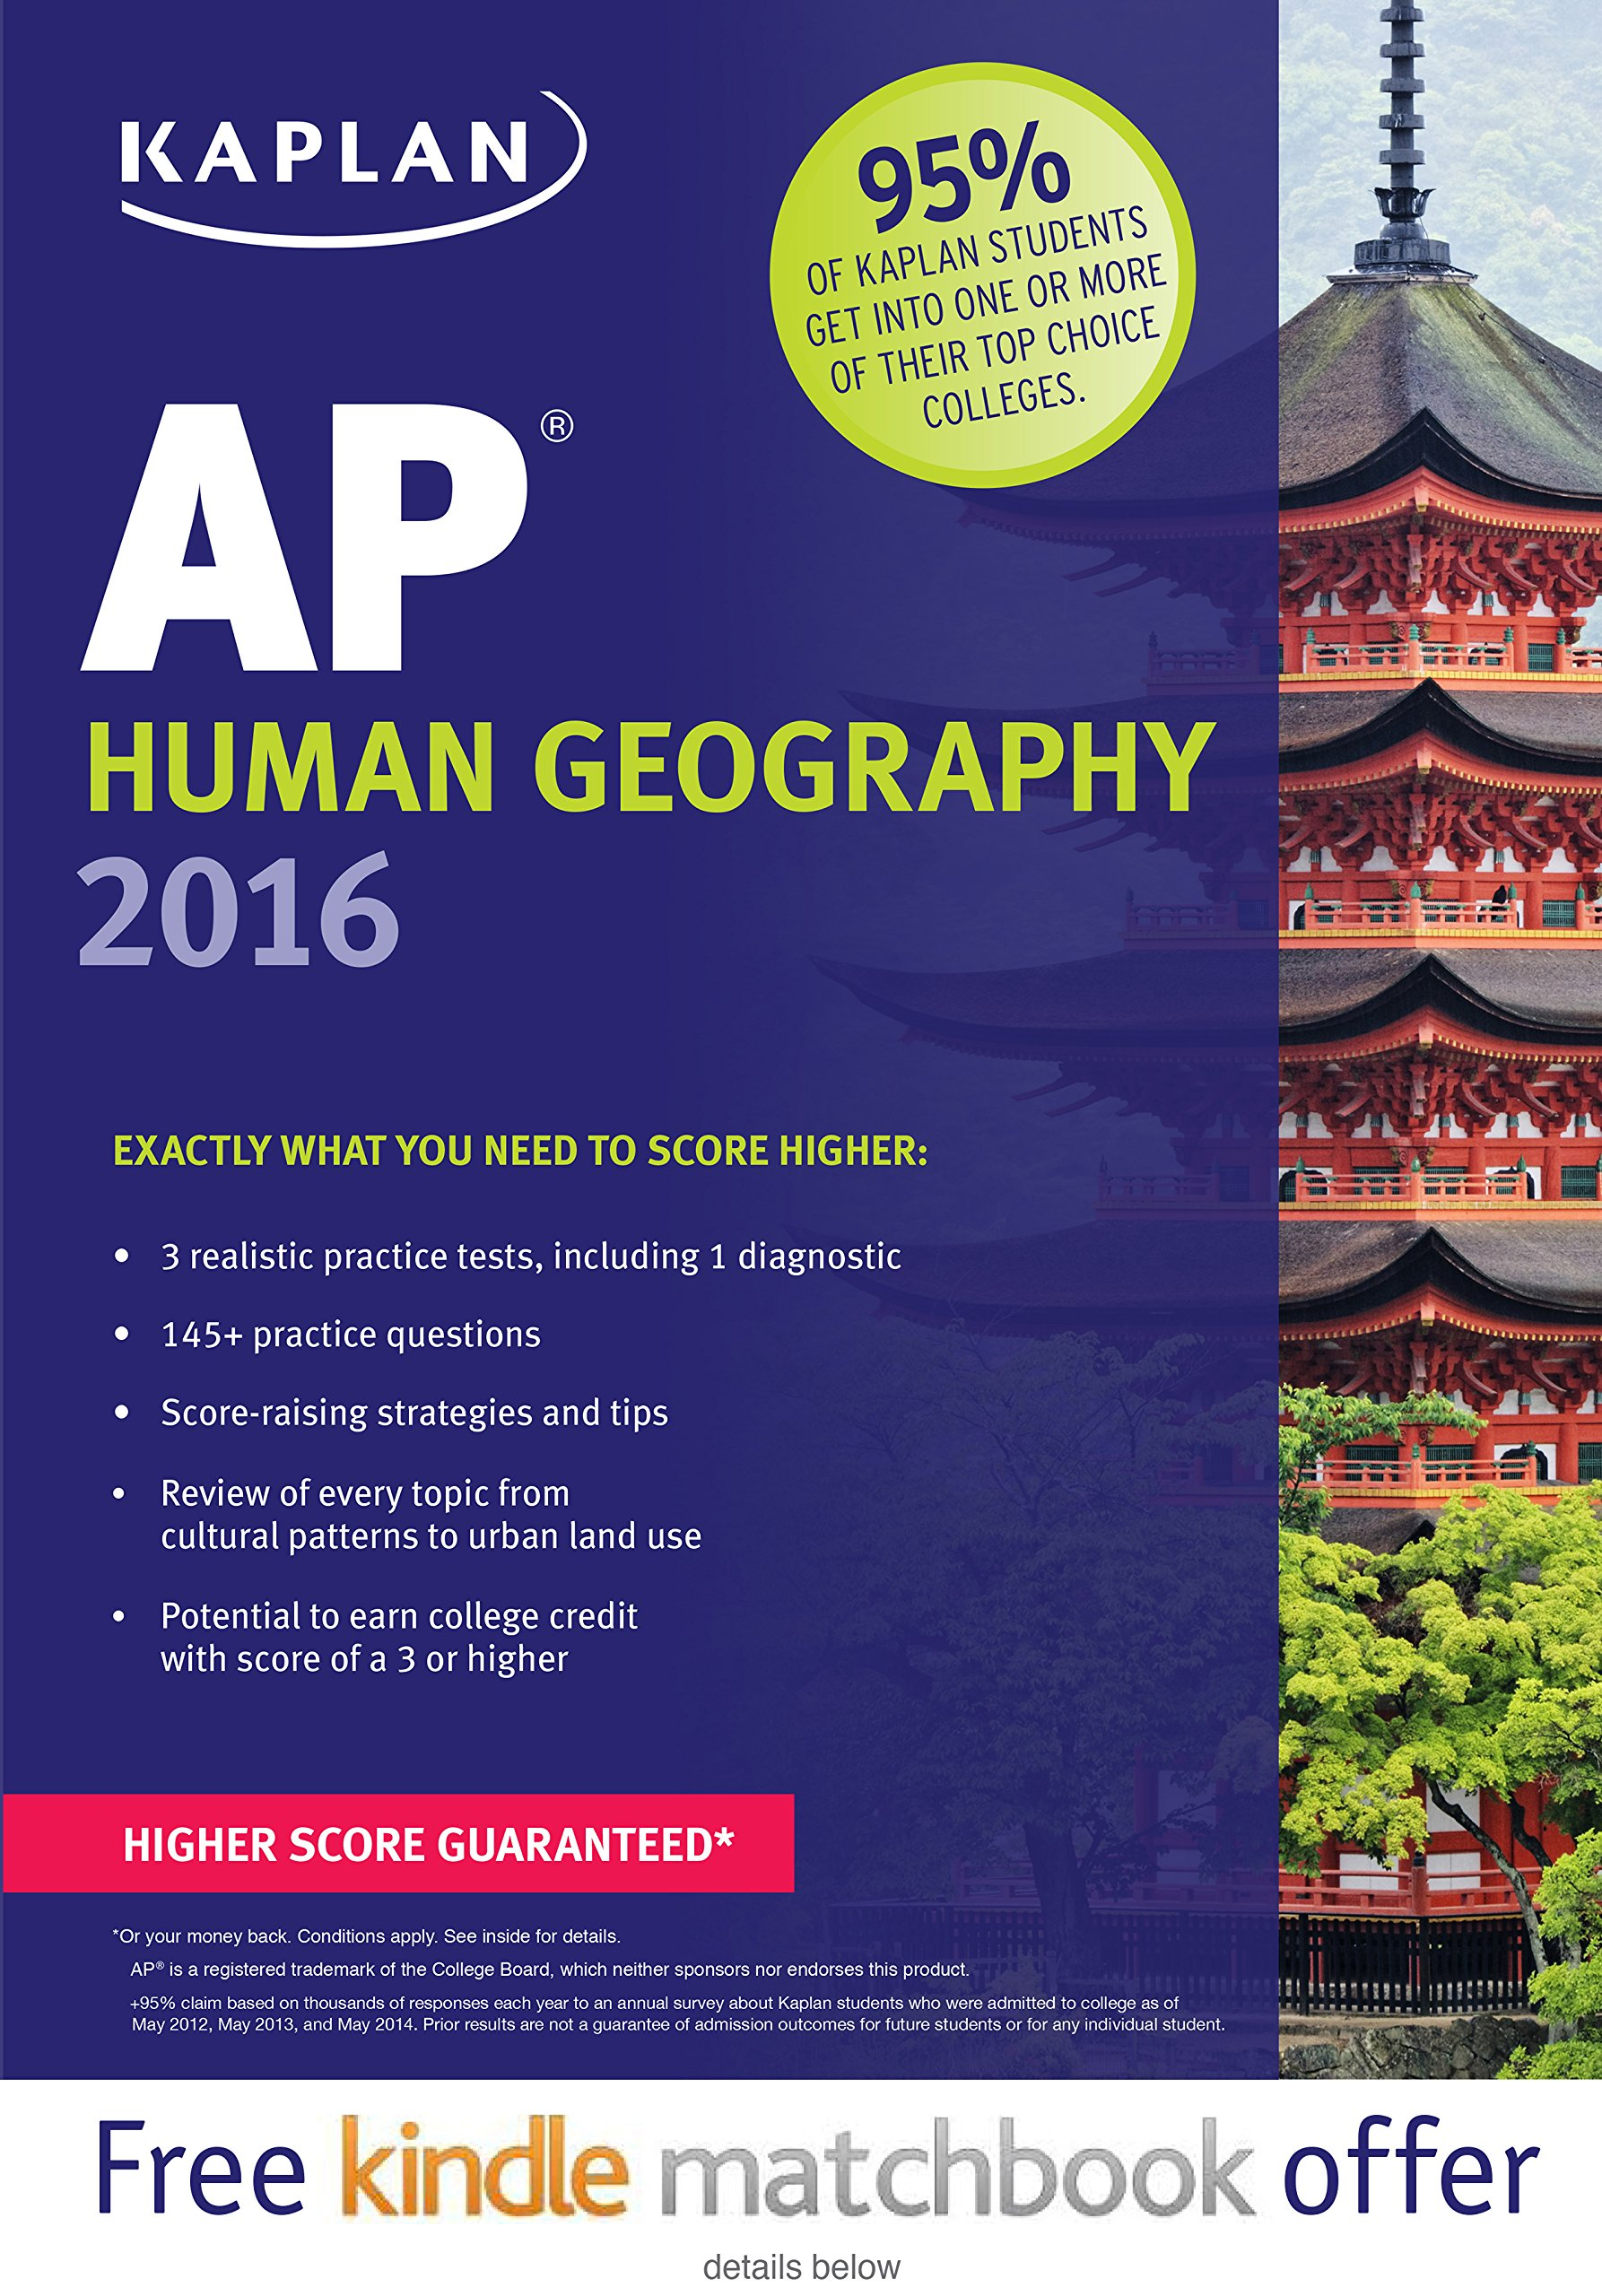 Kaplan Human Geography 2016 Test product image